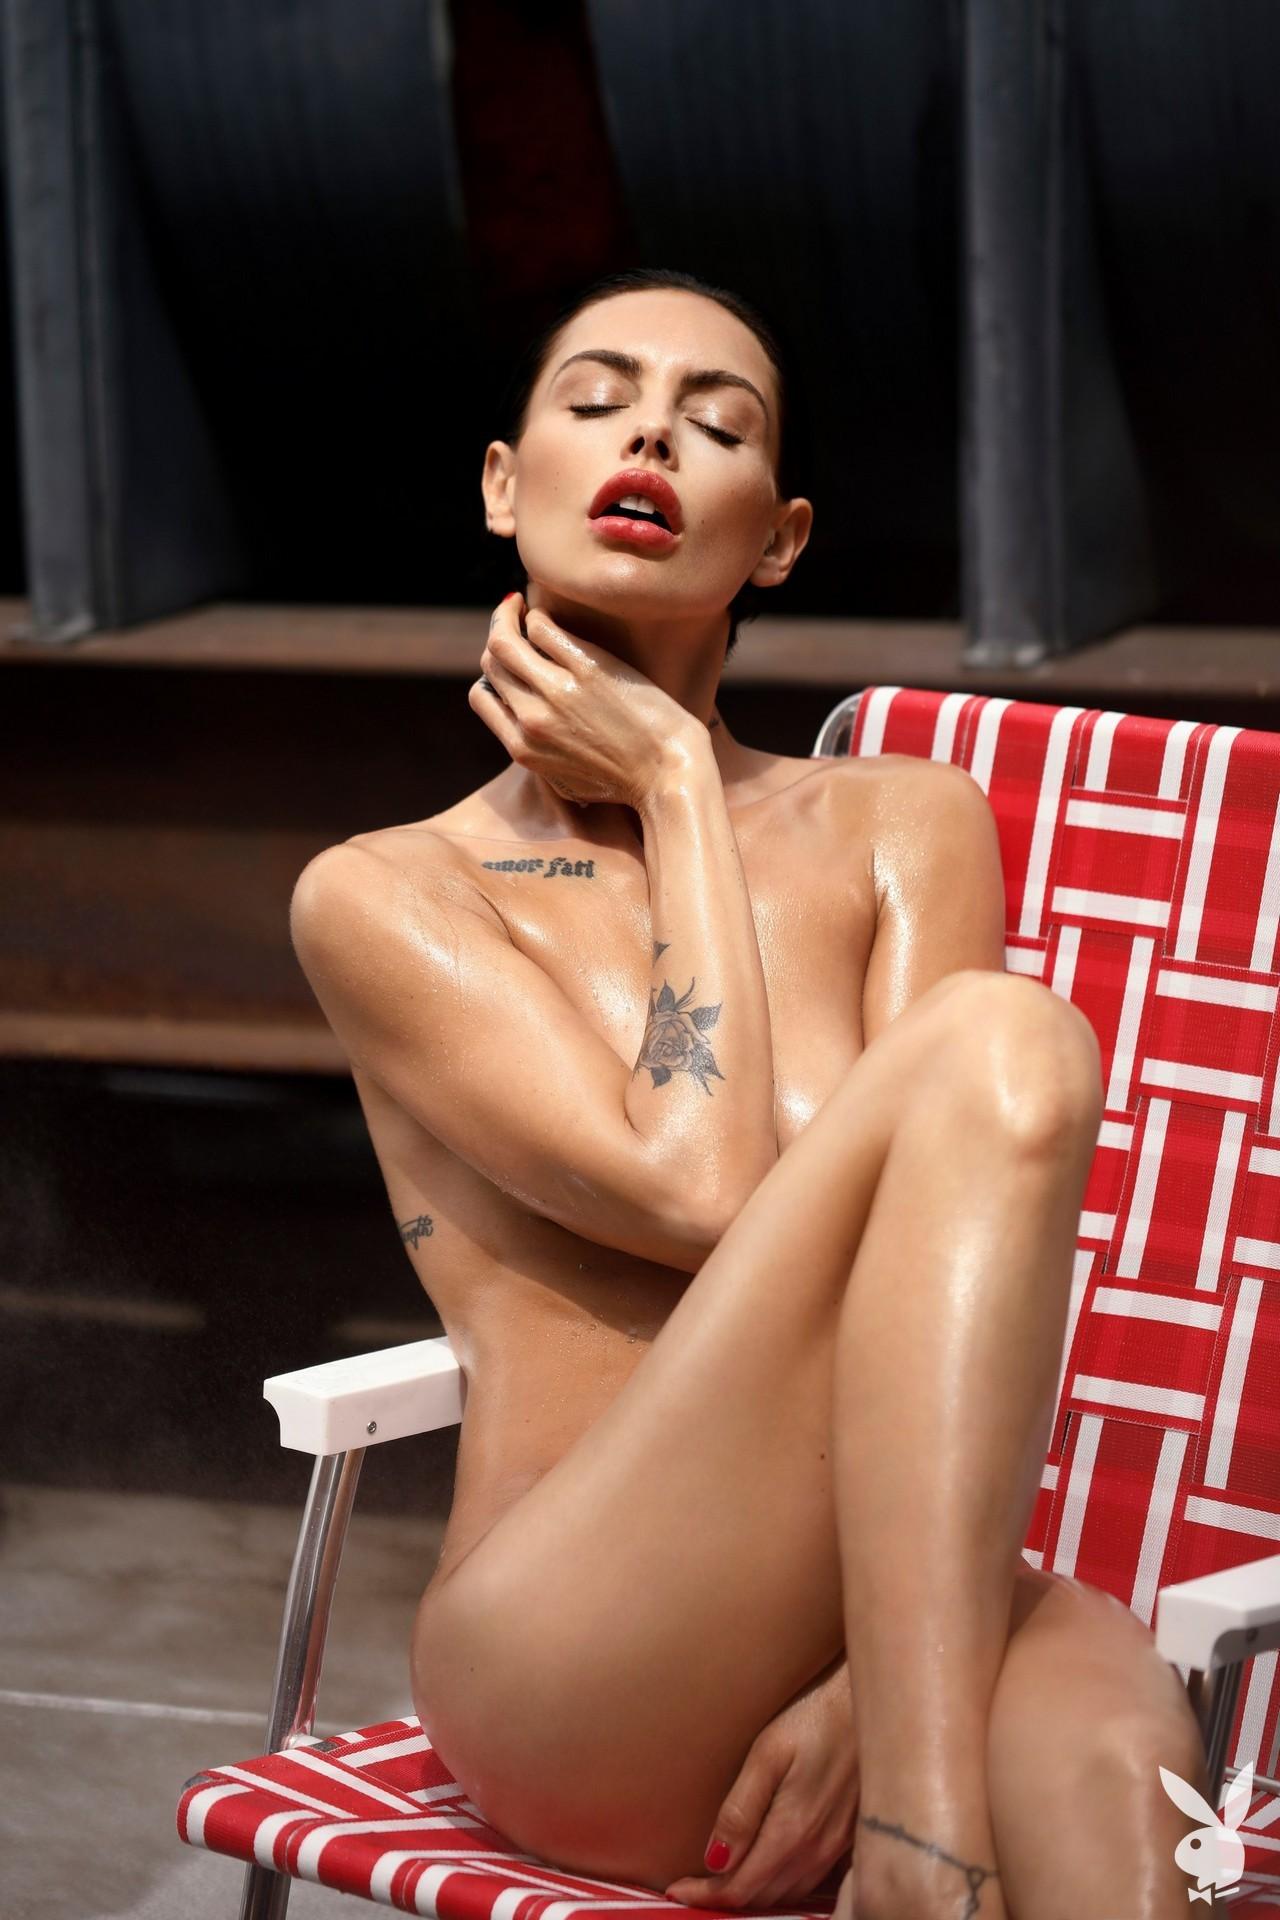 Playmate July 2019 Teela Laroux Playboy Plus (33)